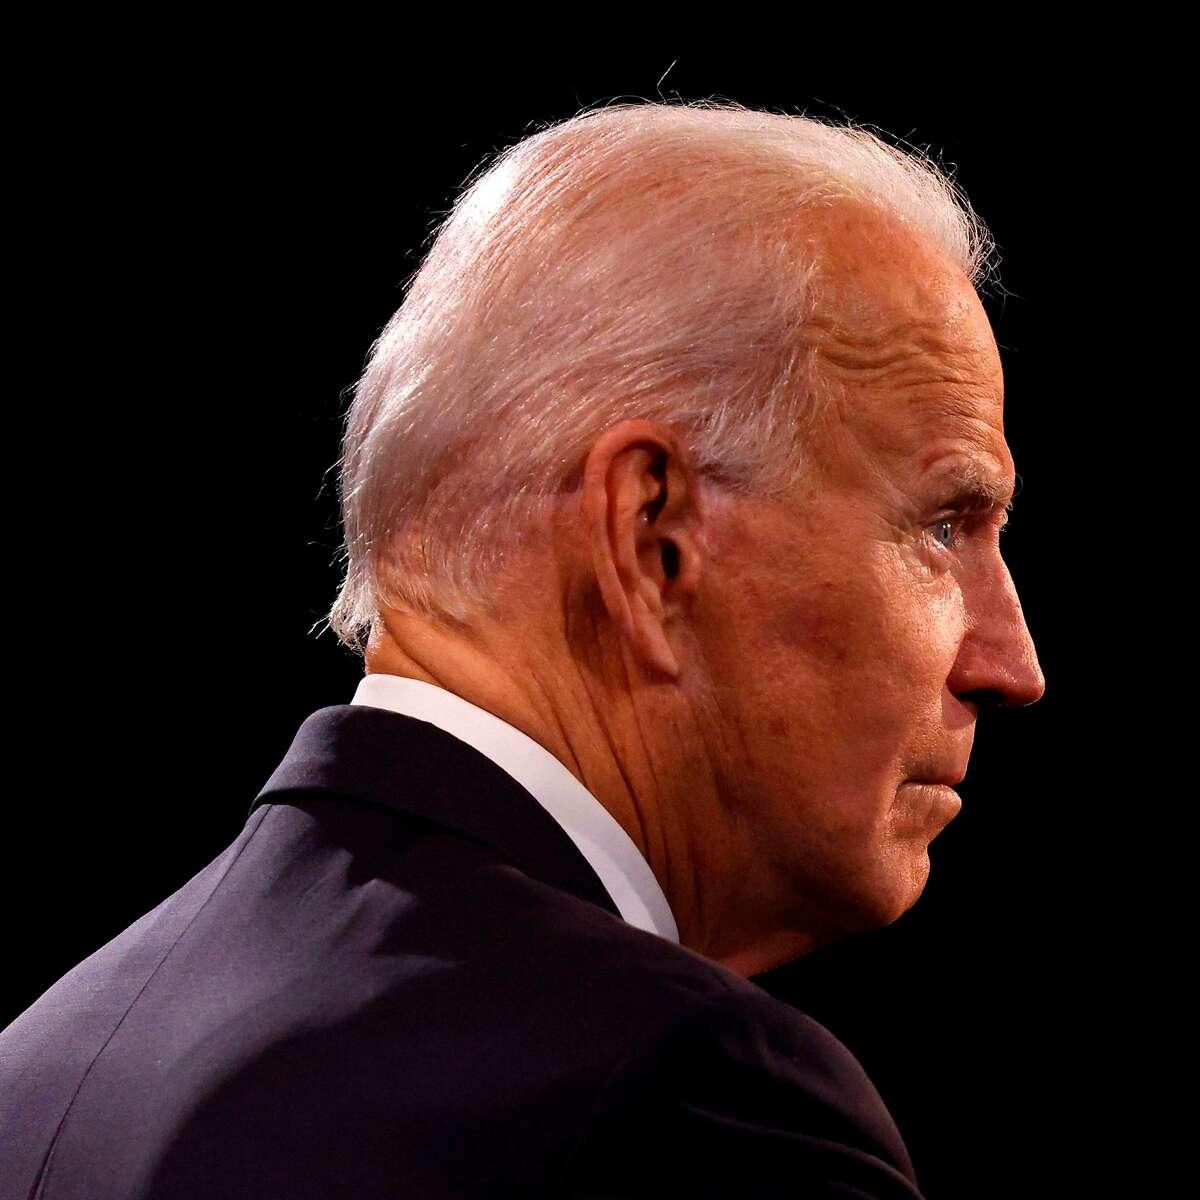 Former Vice President Joe Biden participates in the final presidential debate at Belmont University in Nashville.